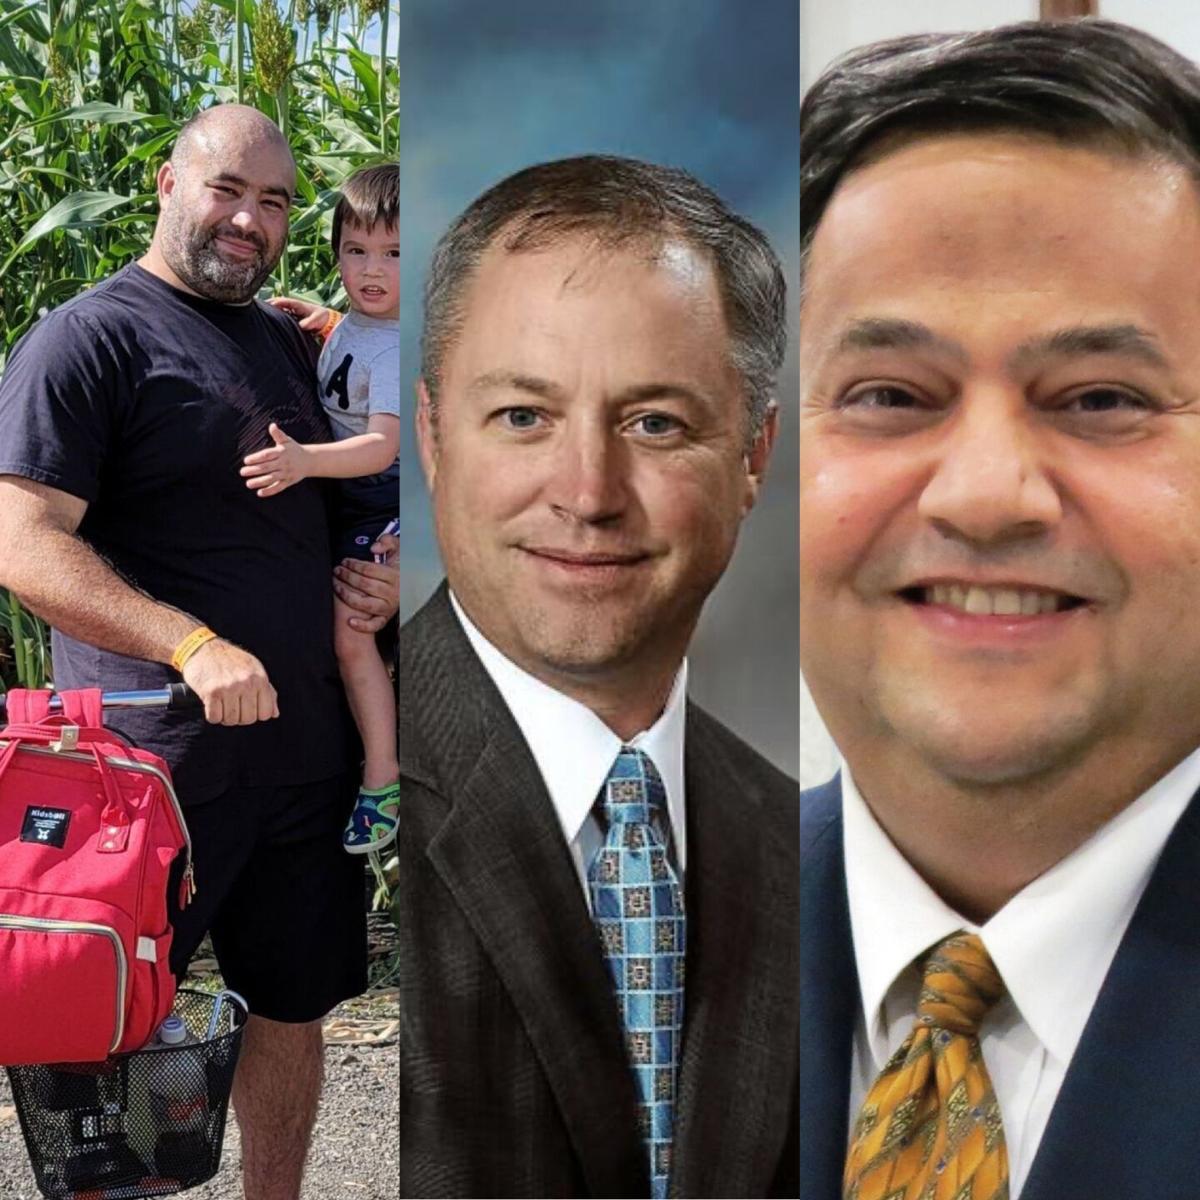 David Crook, Jeff Bauknight, Emett Alvarez